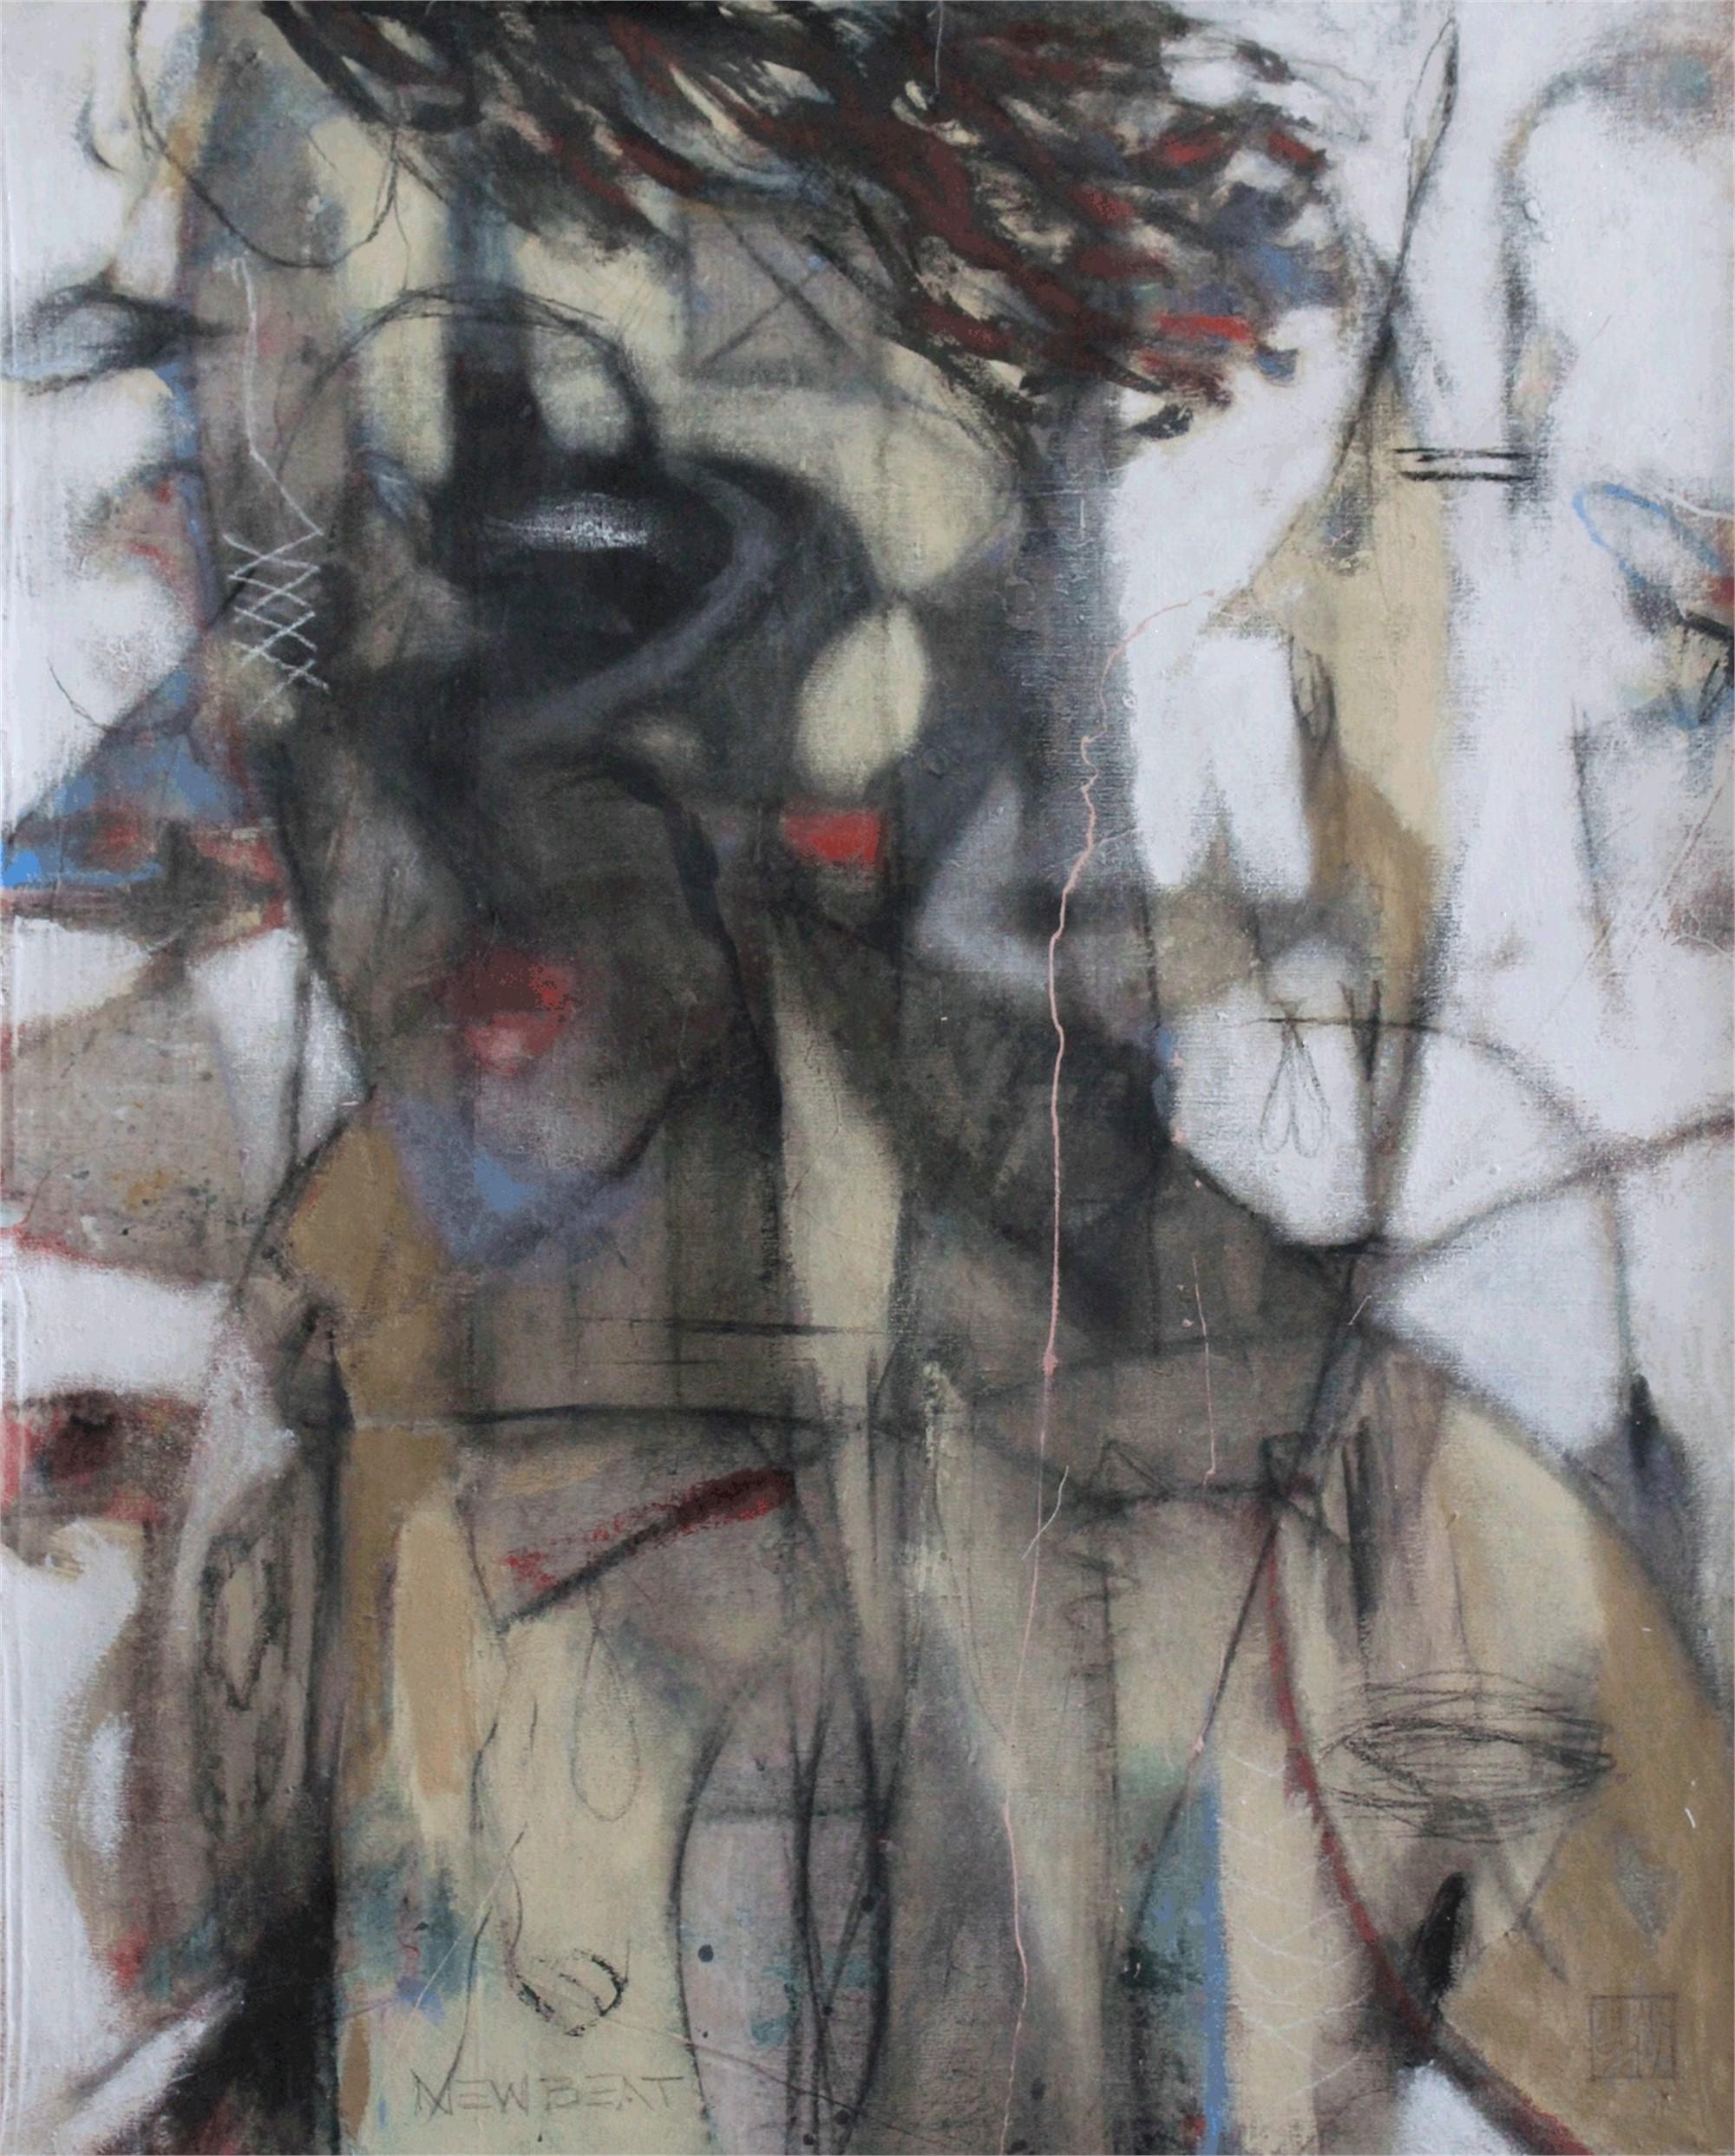 Gracioso by Michael Gadlin